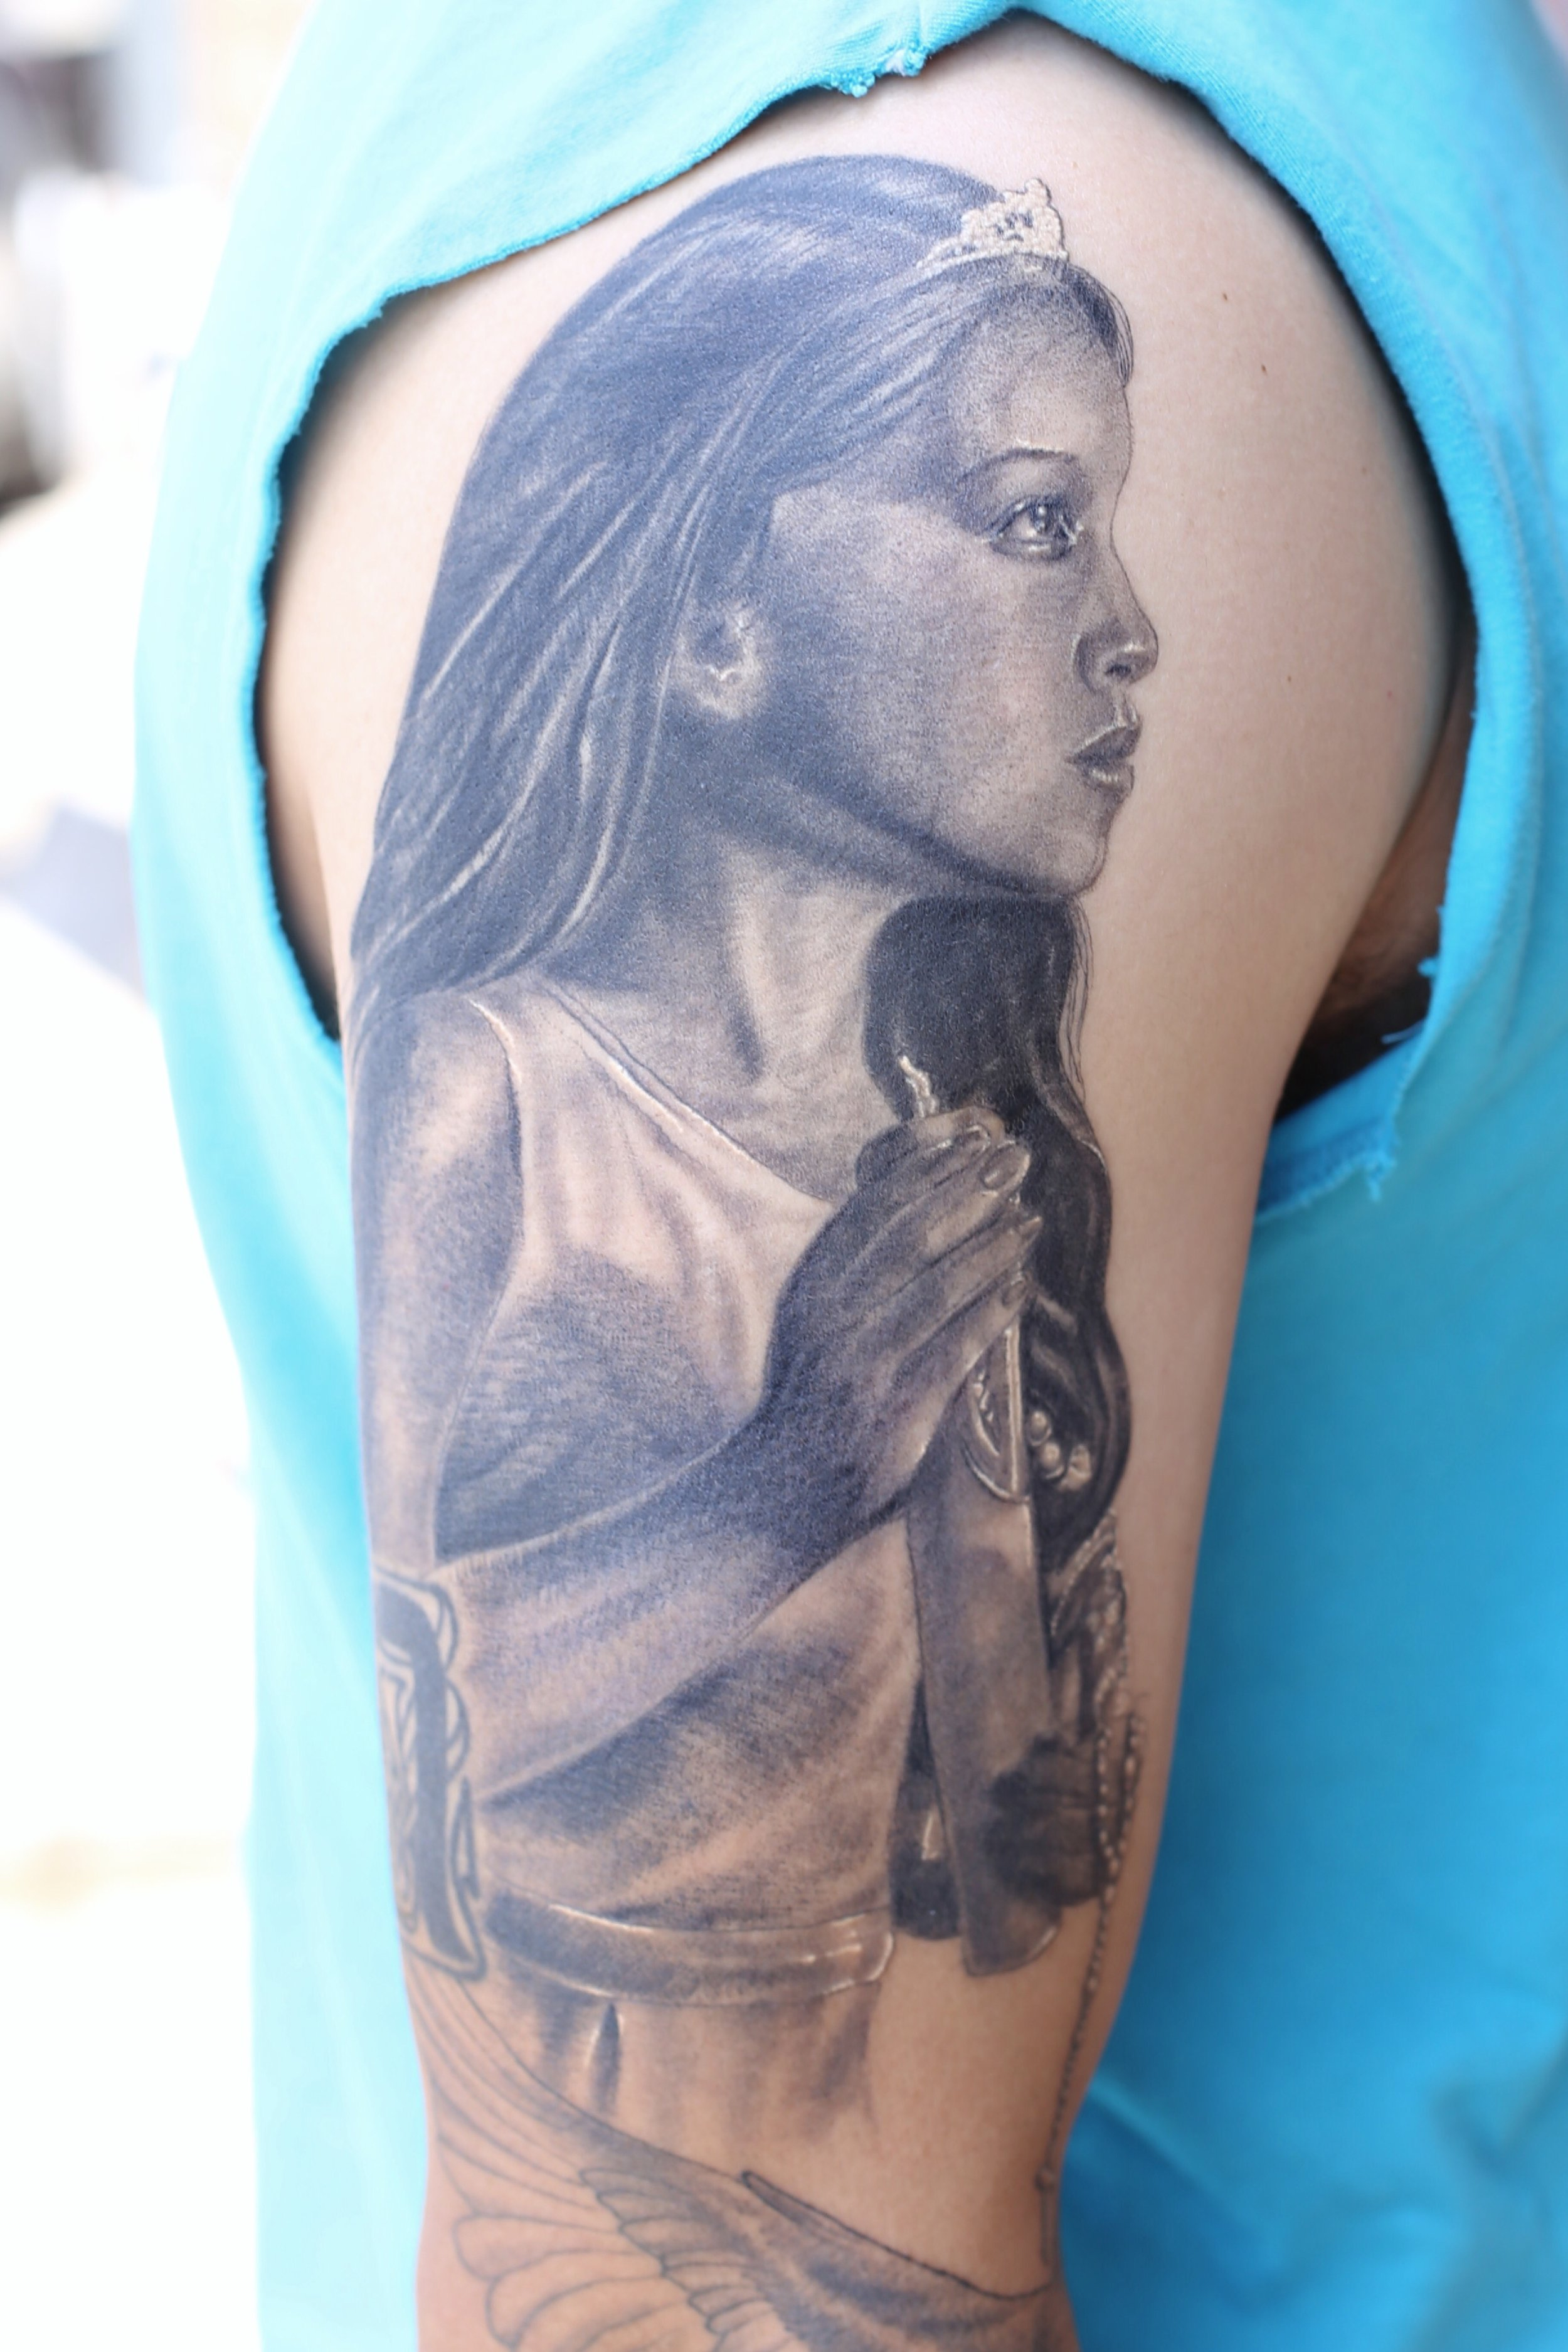 enrique bernal ejay tattoo dallas texas portait .jpeg